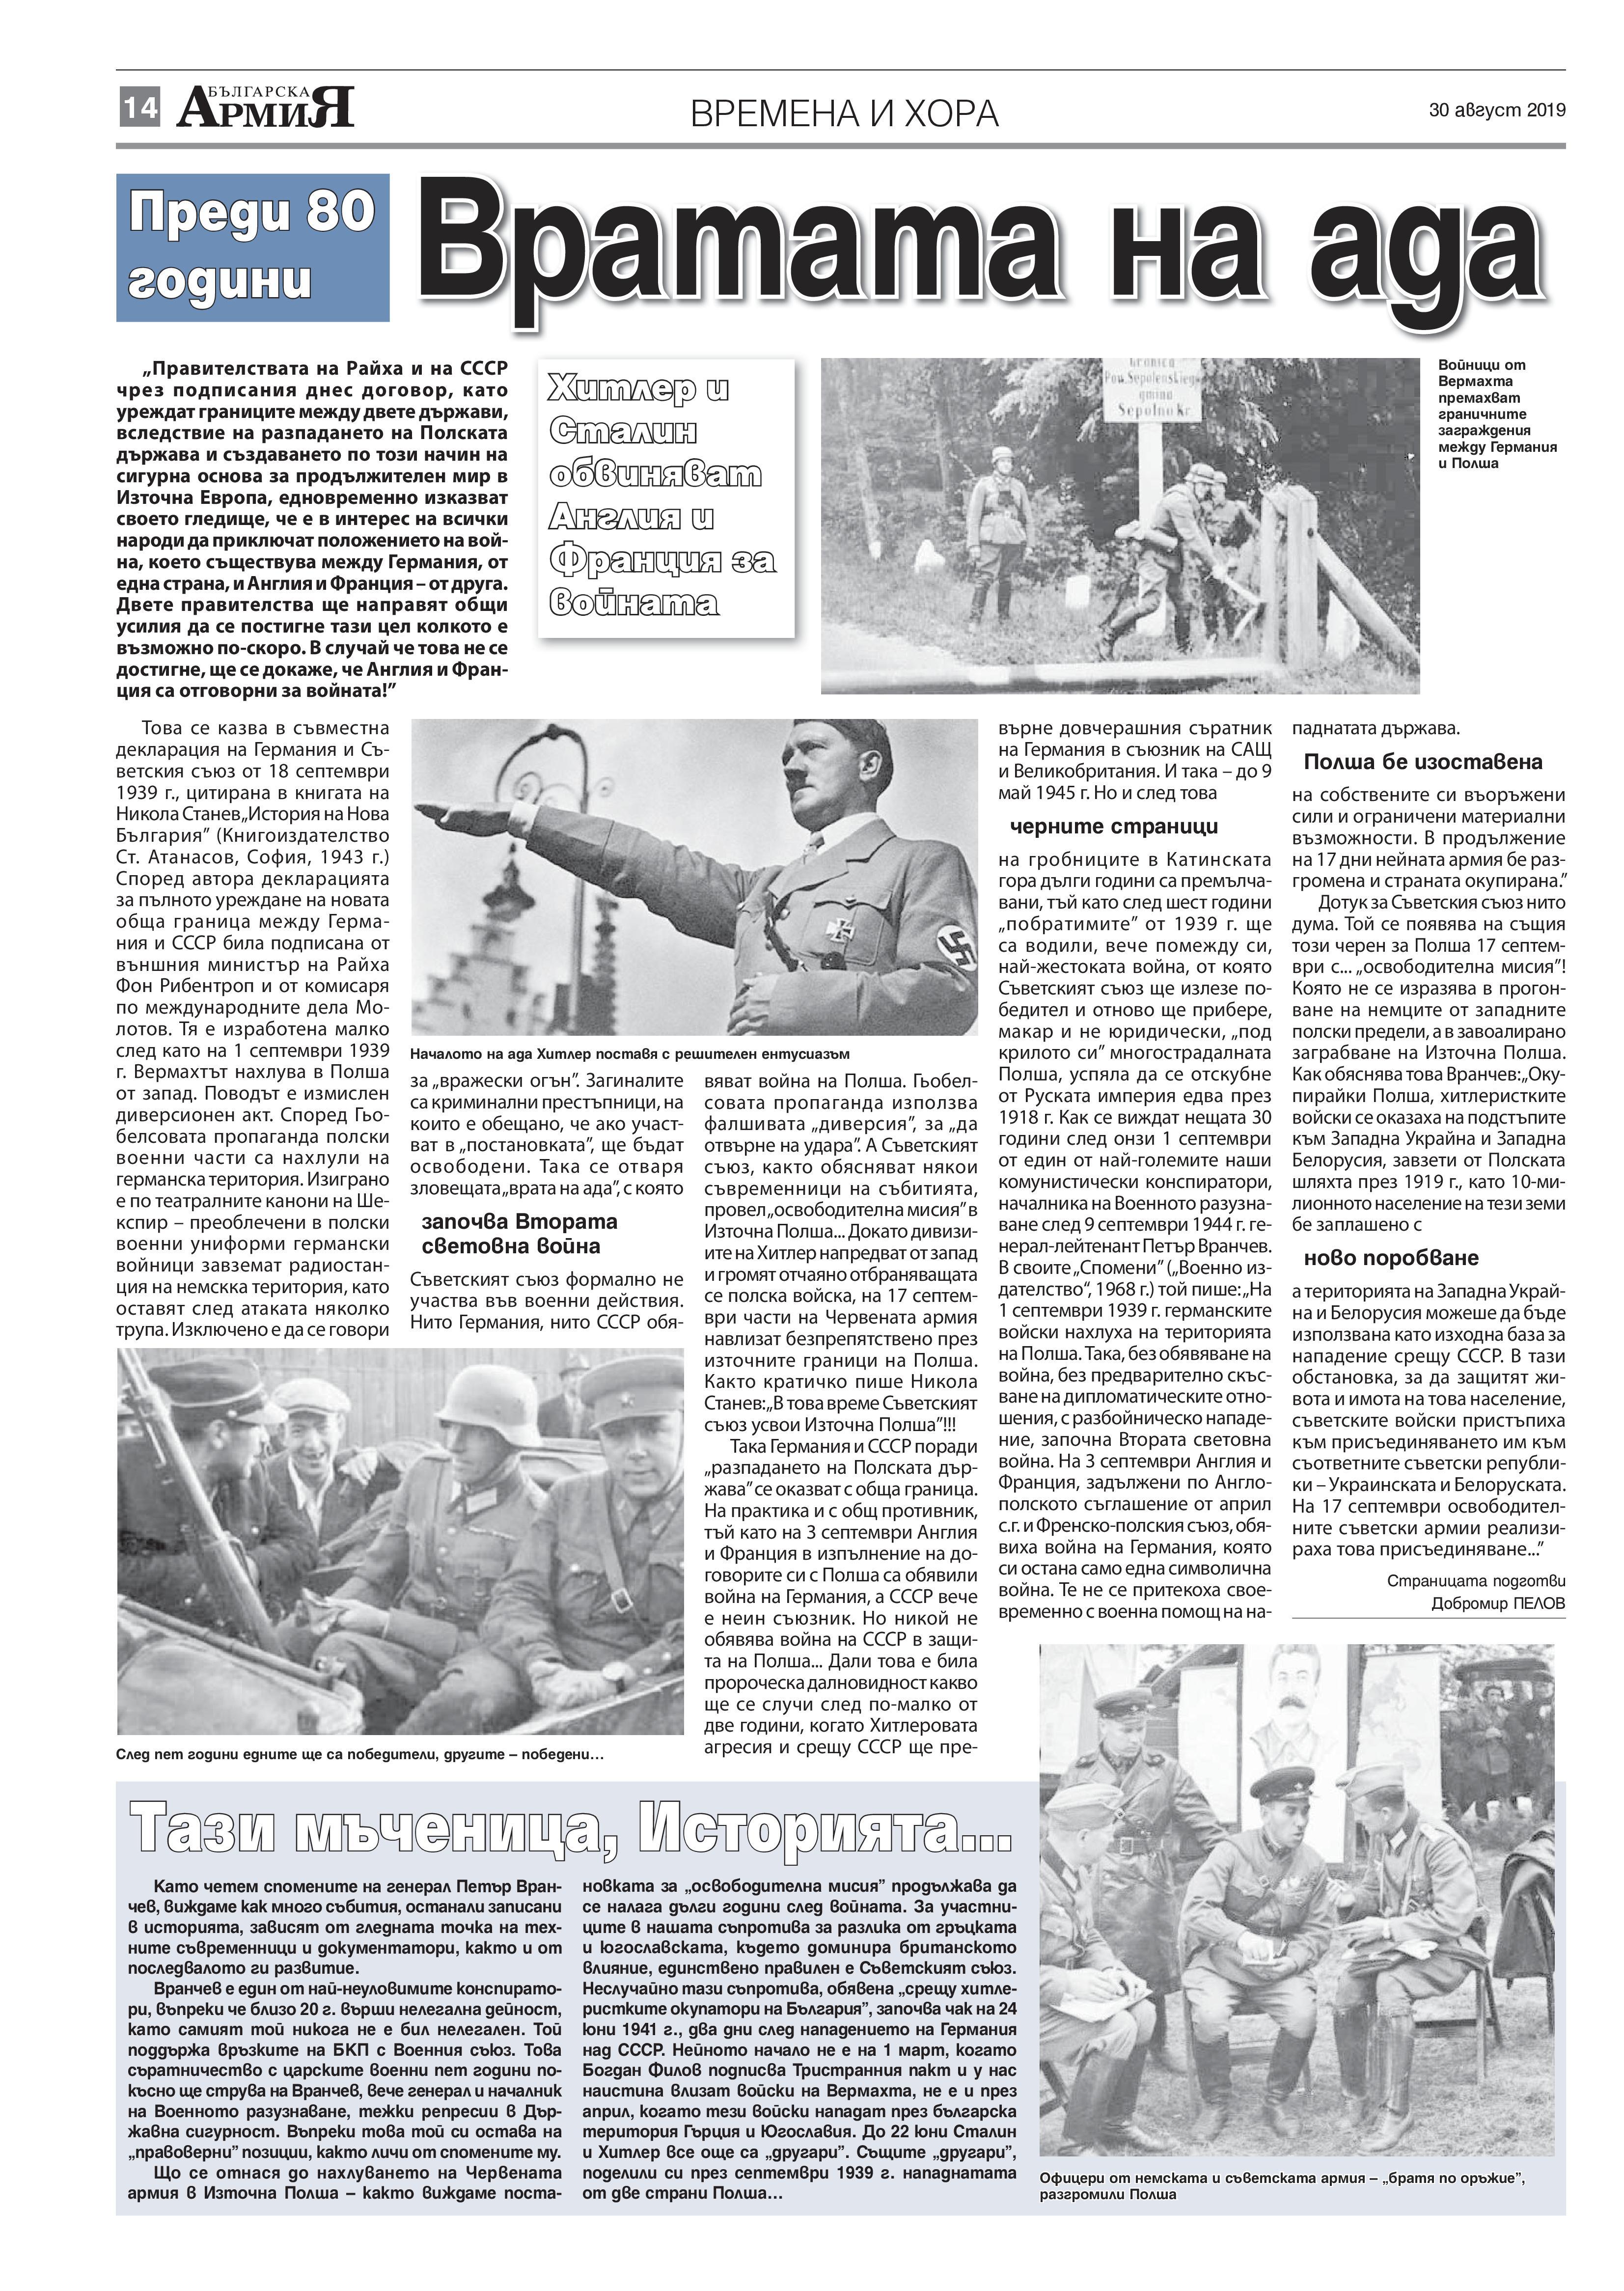 https://armymedia.bg/wp-content/uploads/2015/06/14-31.jpg